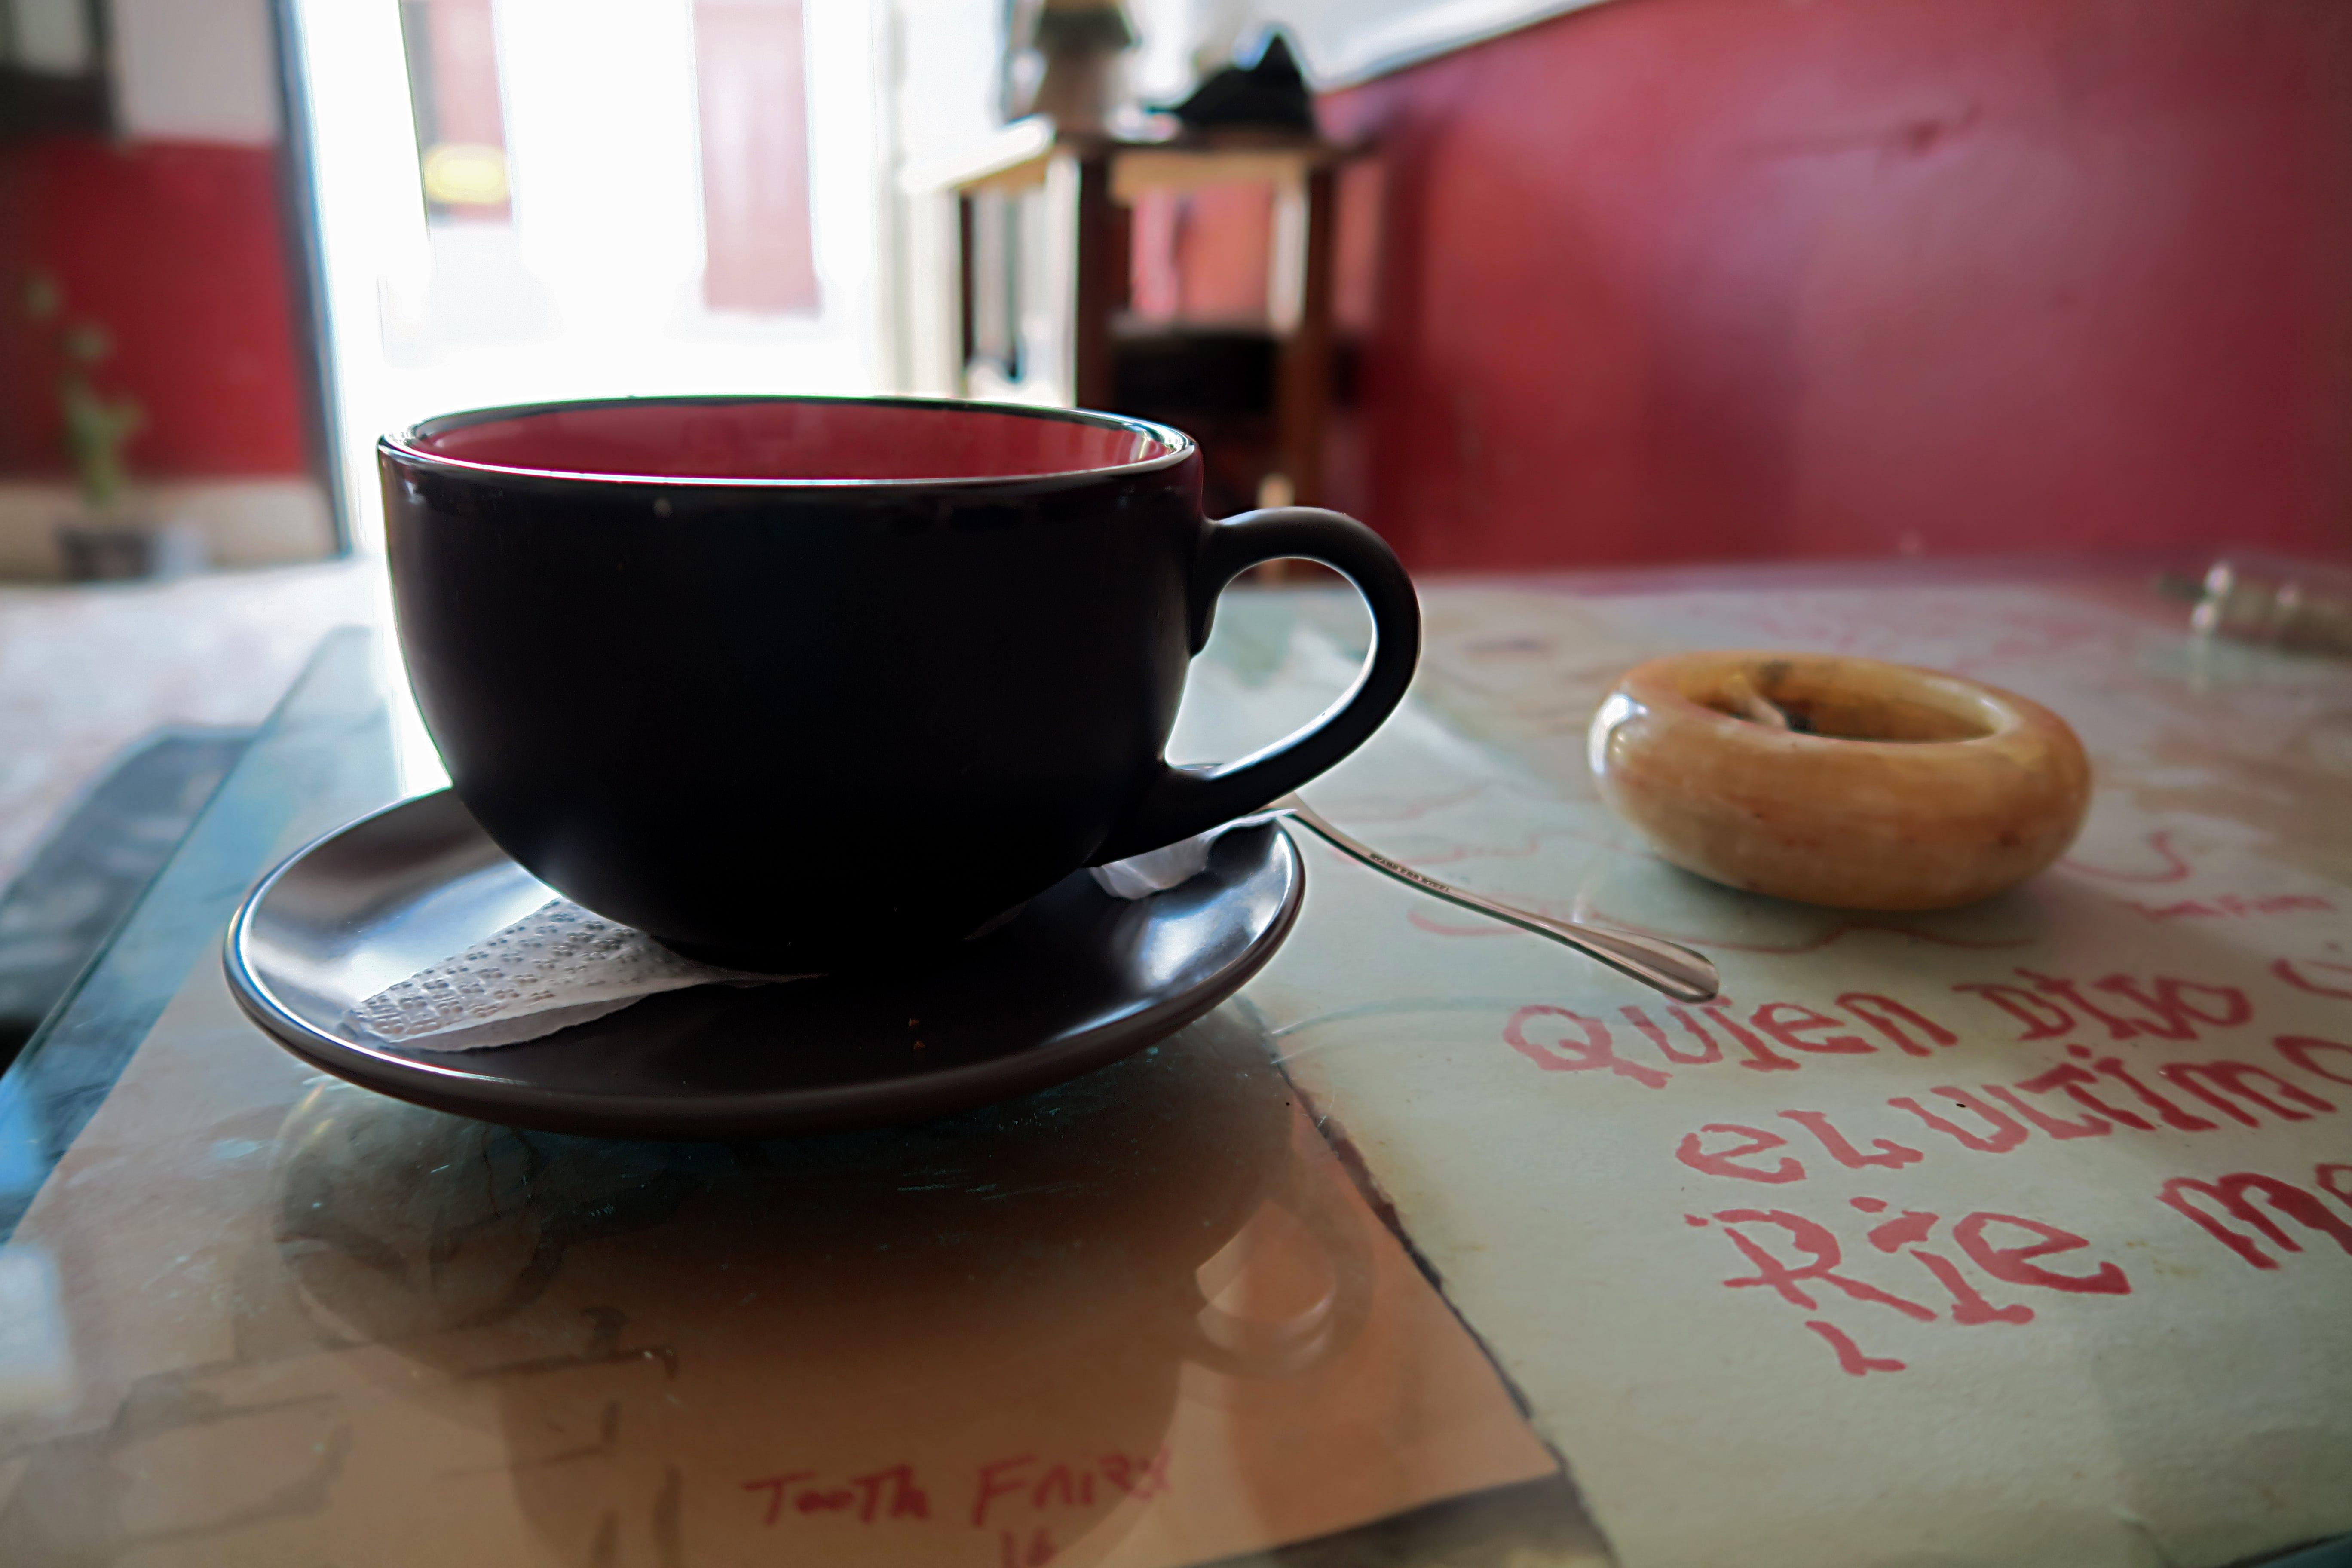 kuba, cienfuegos, cafe buena_pipa